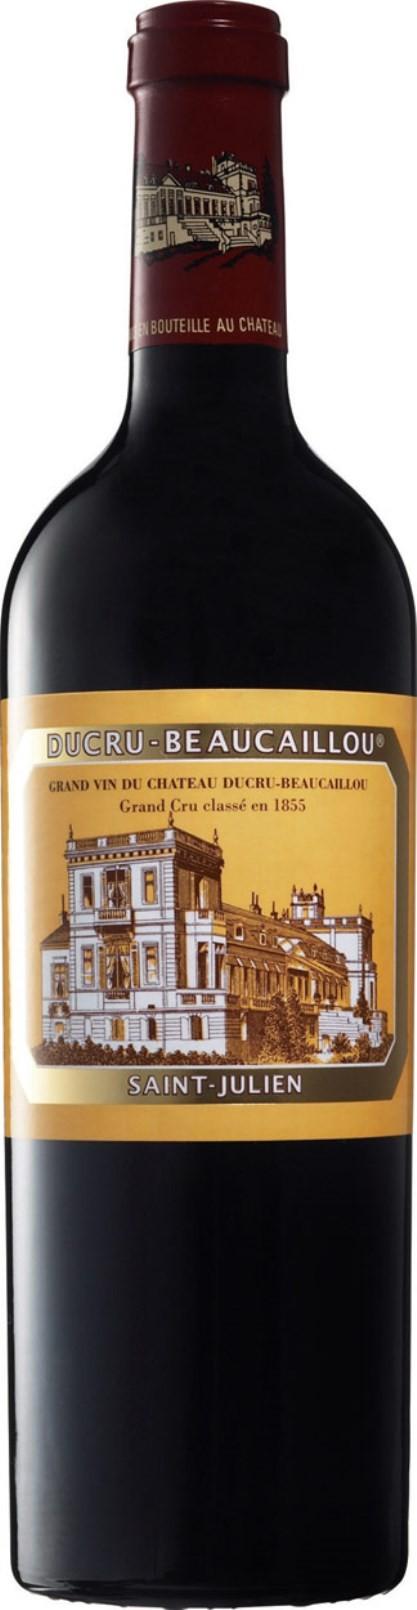 Chateau Ducru Beaucaillou 2014, Saint Julien